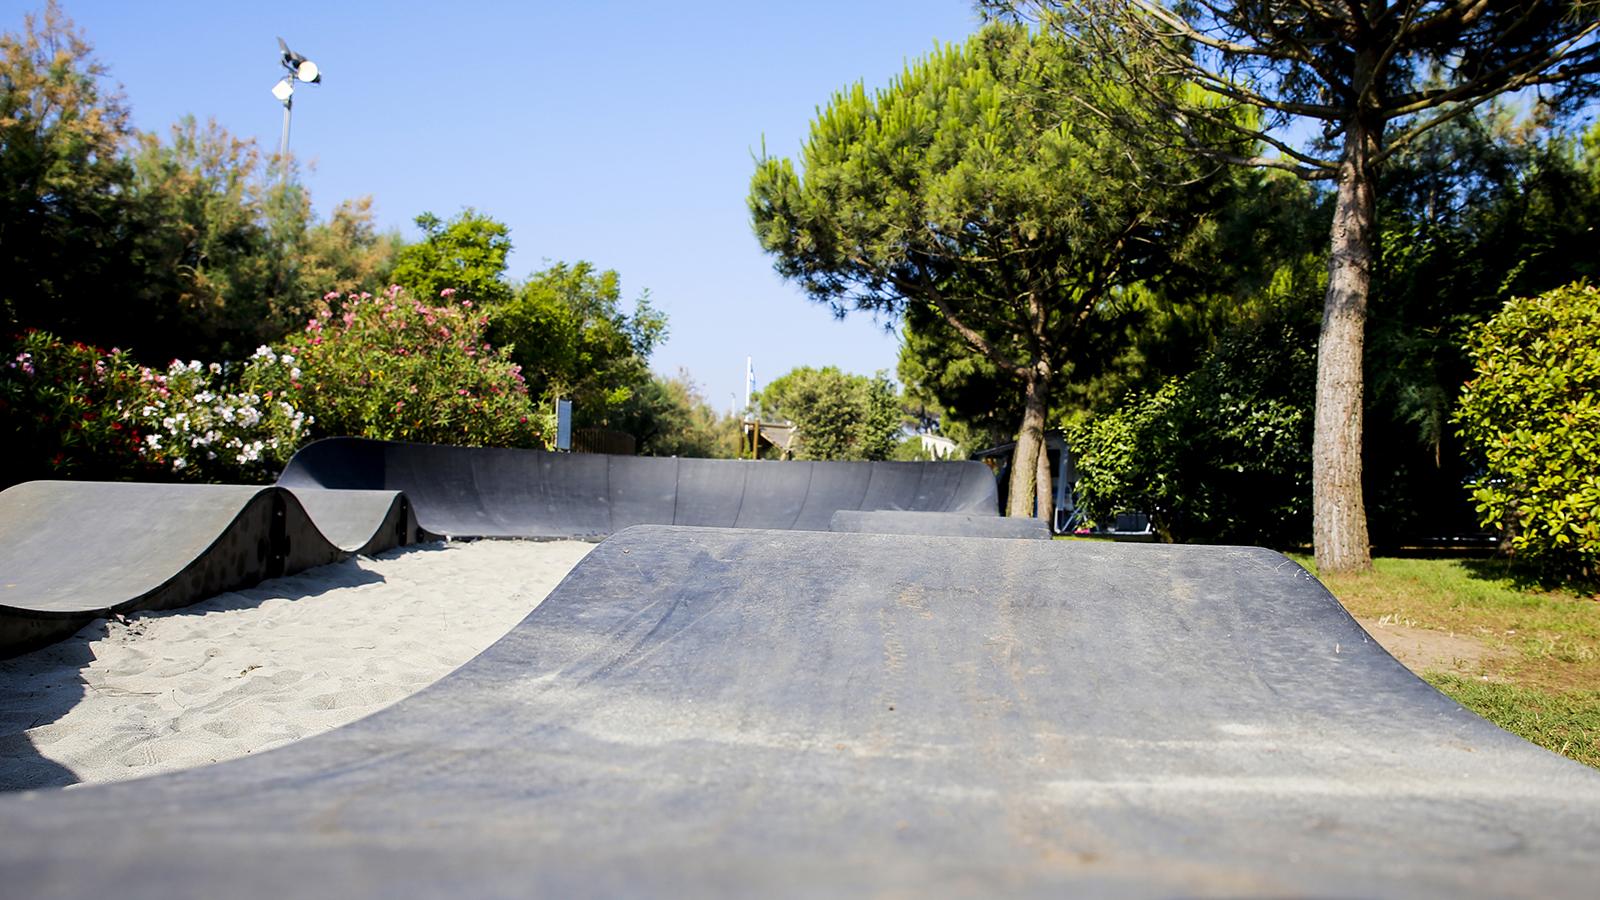 2-Skate-park-Campingplatz-dei-Fiori